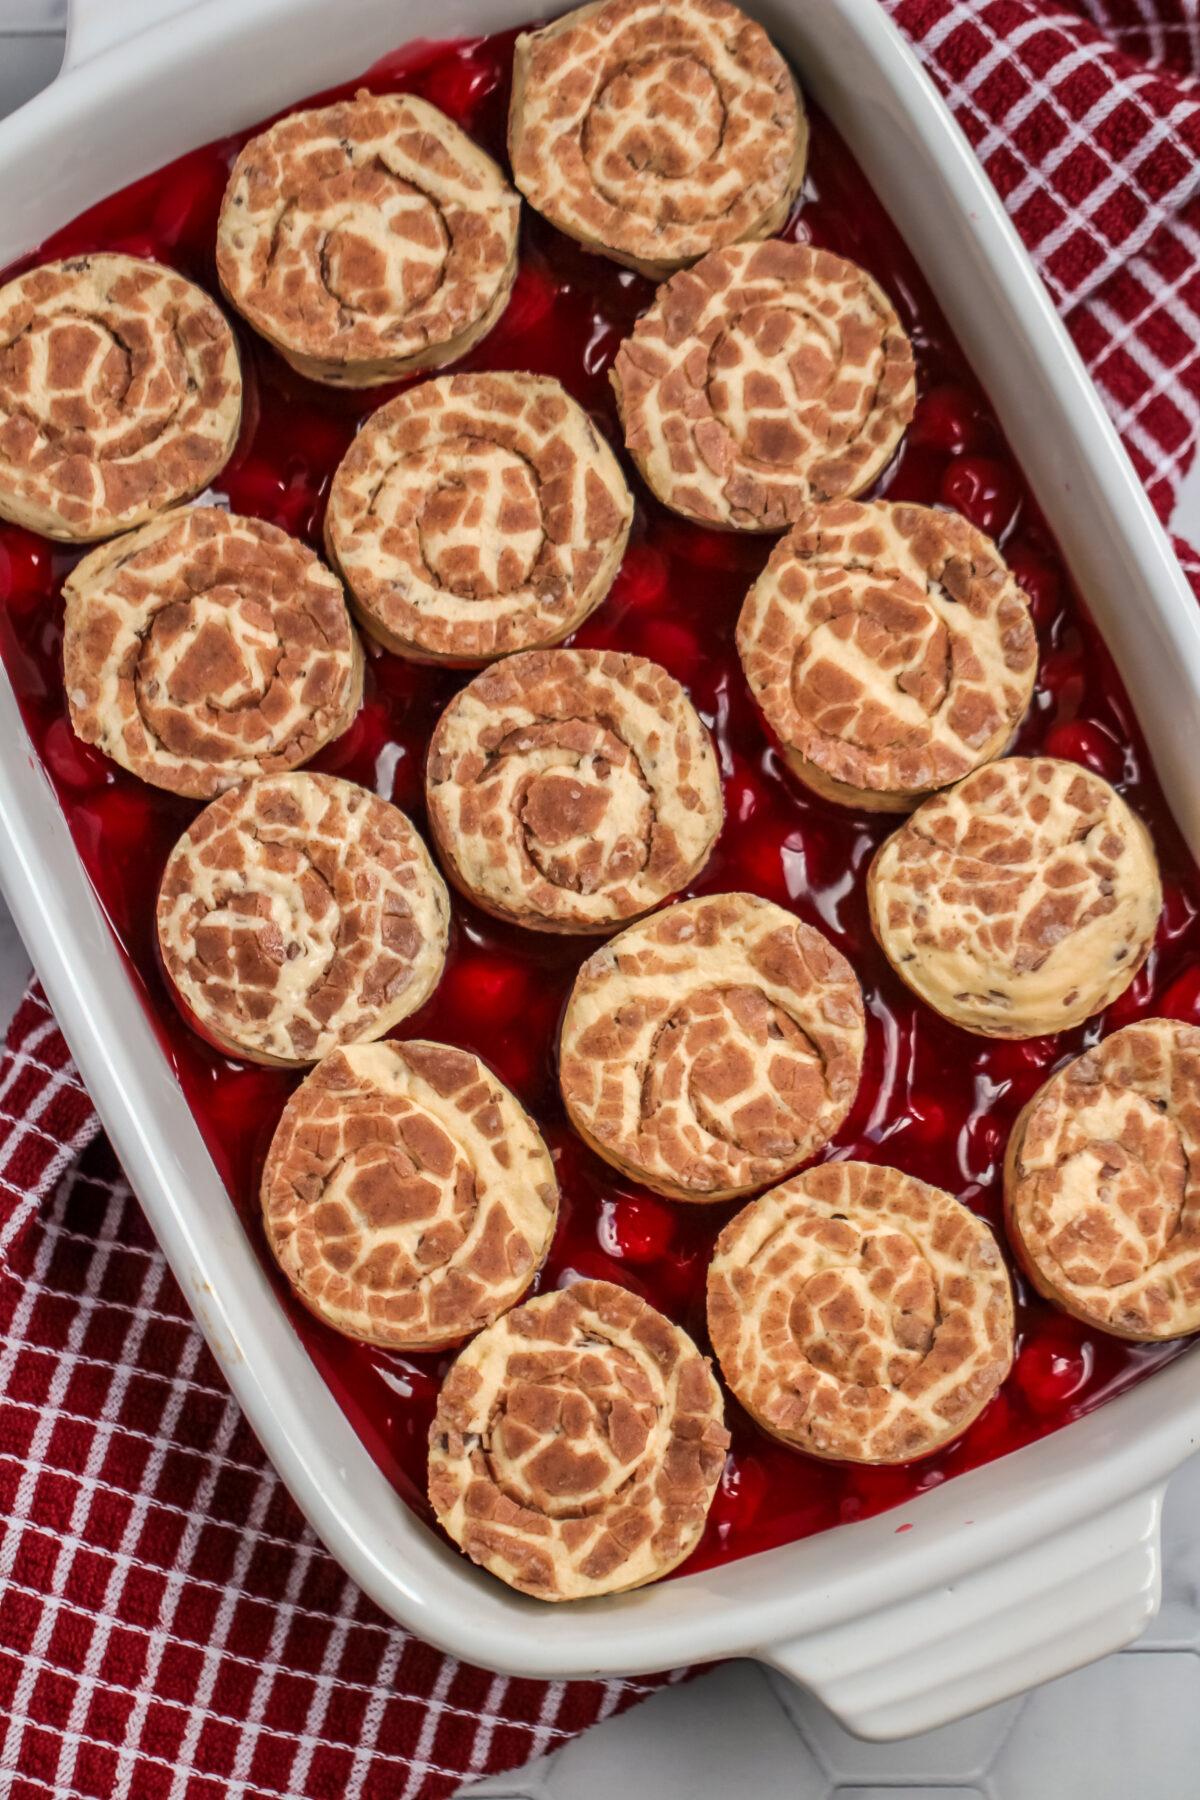 cinnamon rolls on top of cherry pie filling.